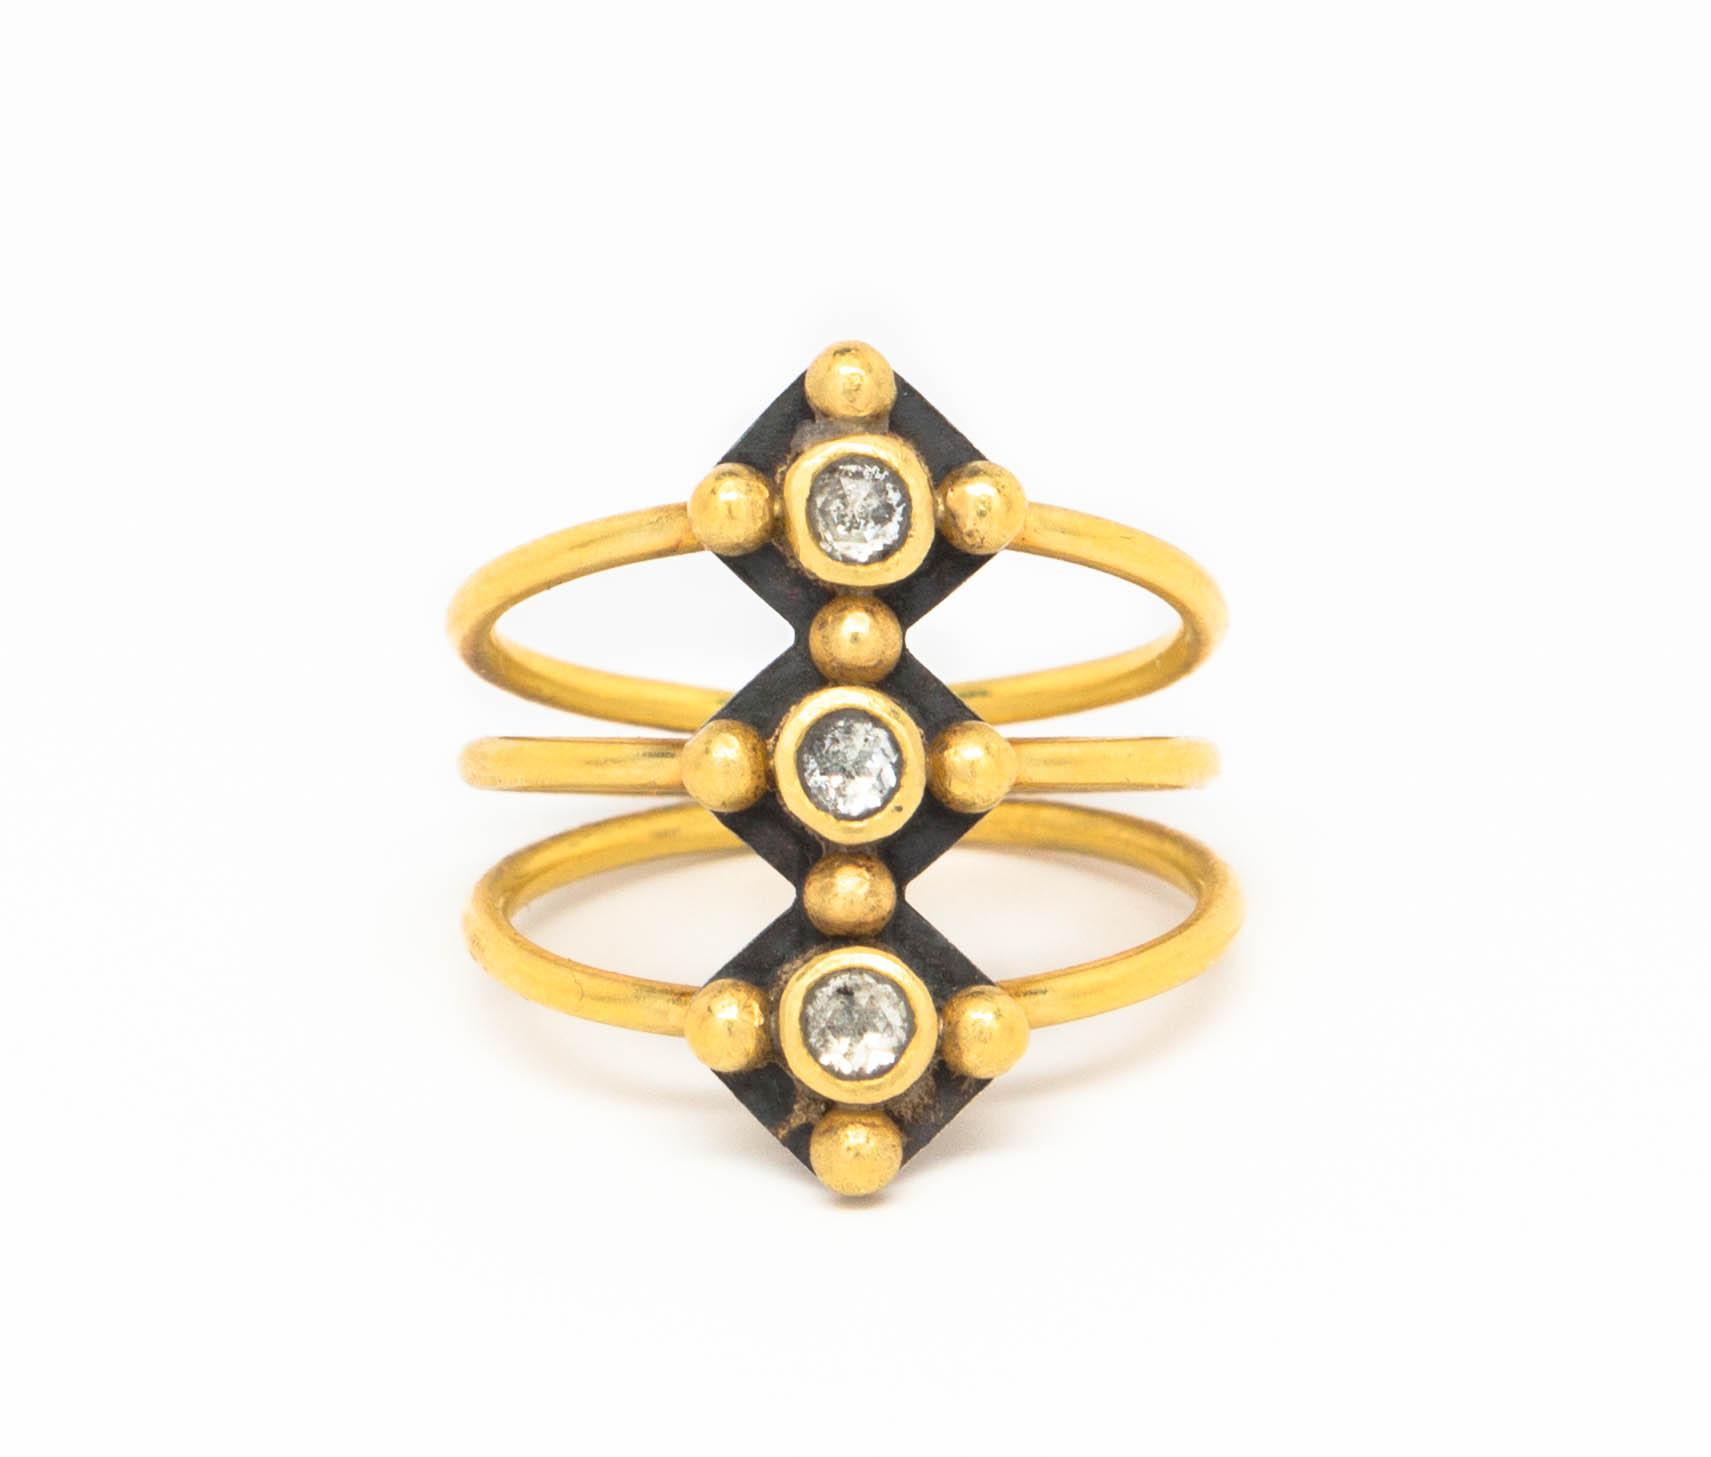 dec21 jewelry5-601.jpg